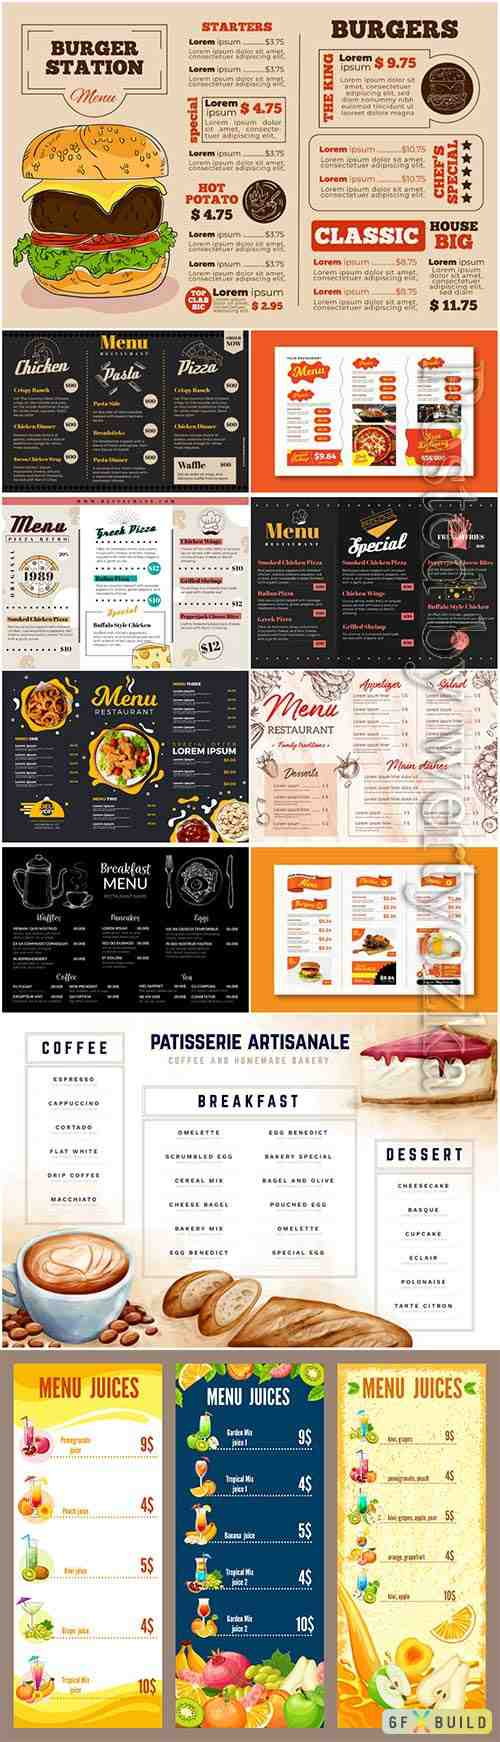 Digital restaurant menu template